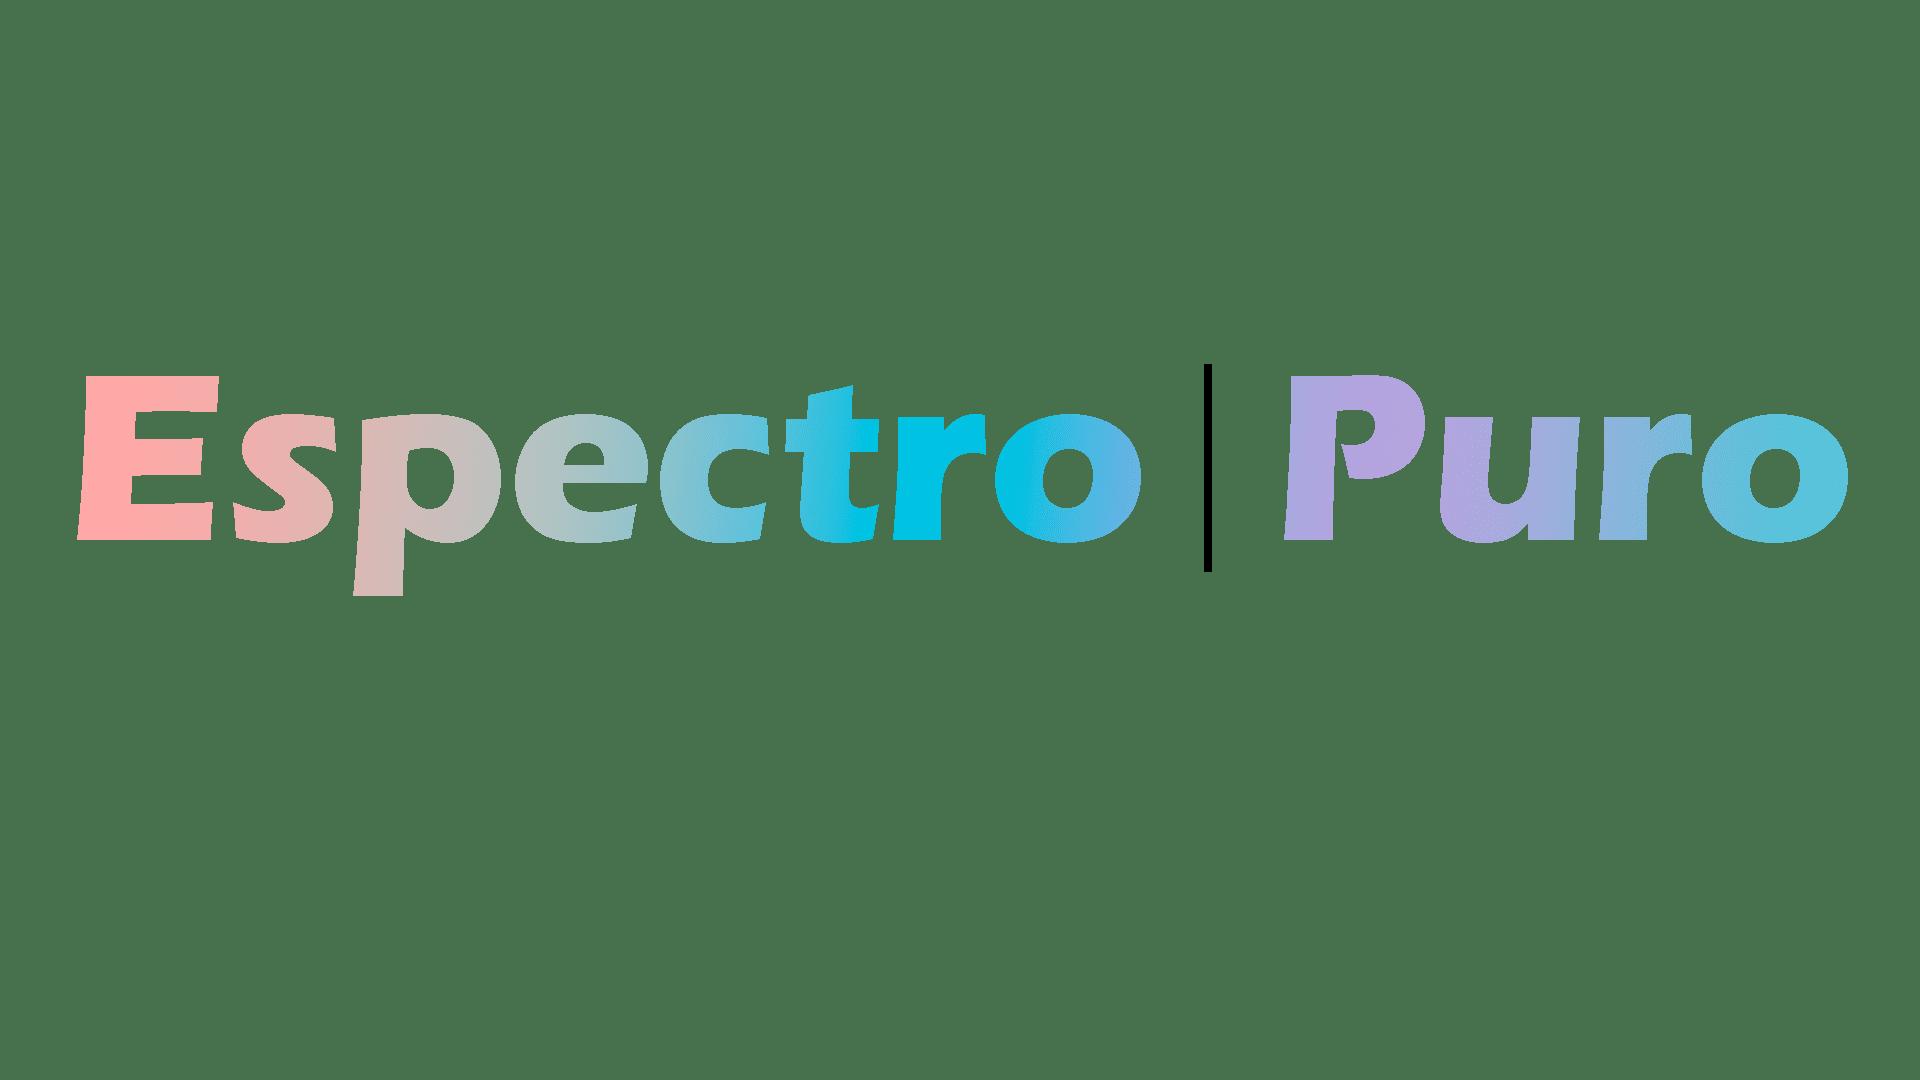 pure spectrum cbd guide system